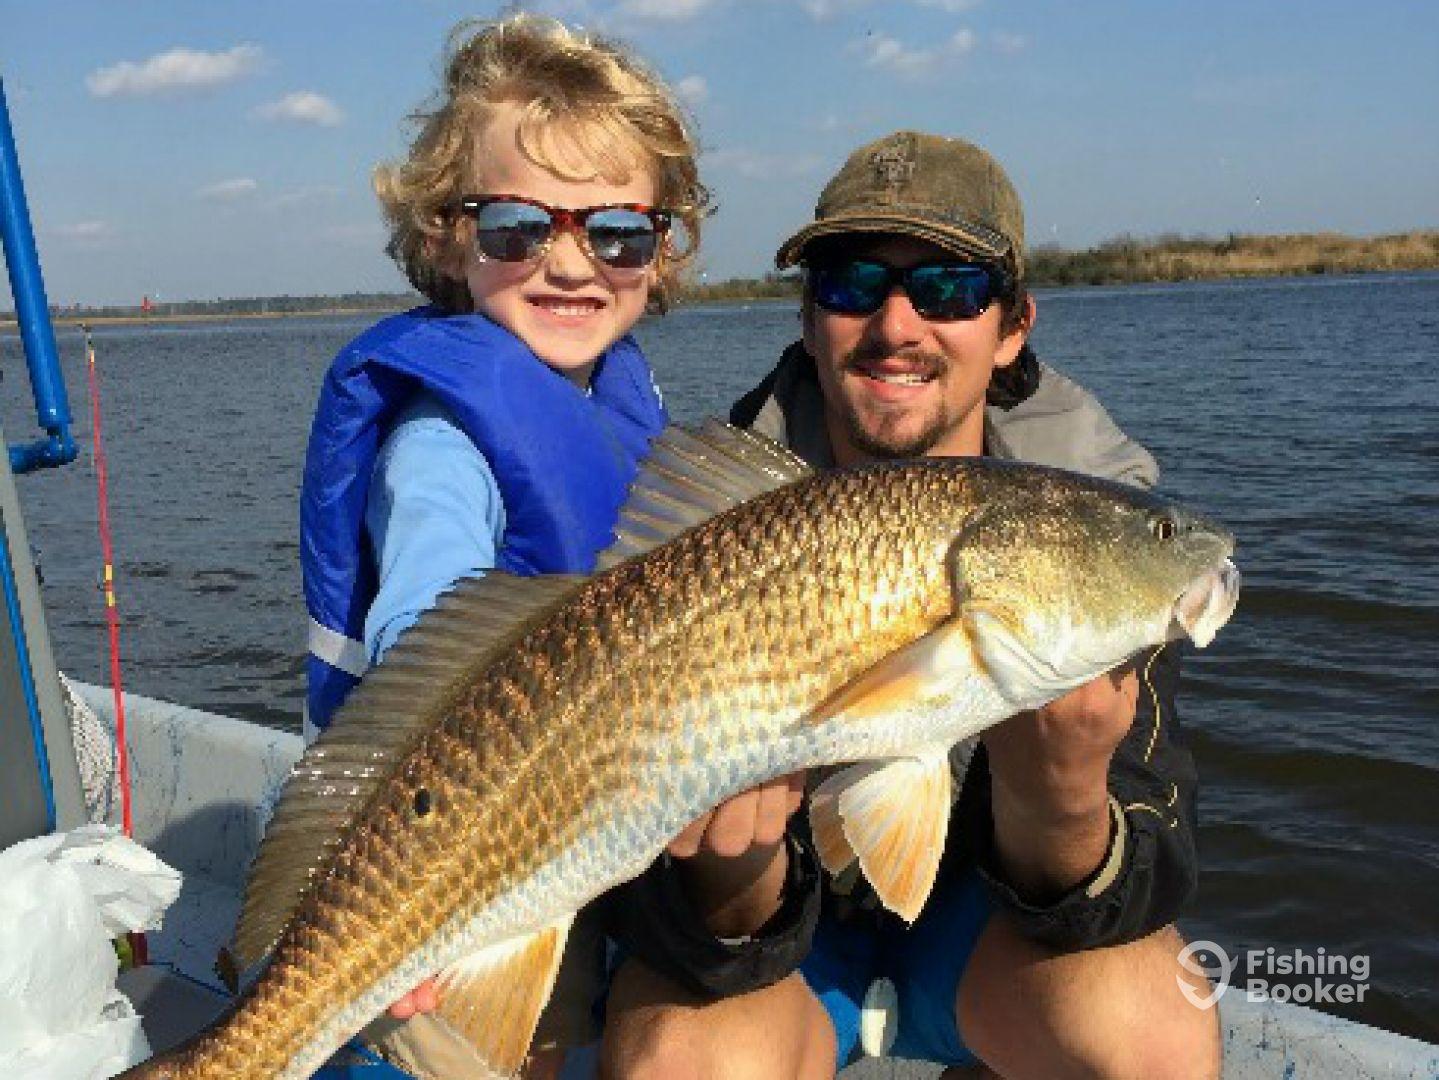 Reel charters llc lake charles la fishingbooker for Lake charles fishing